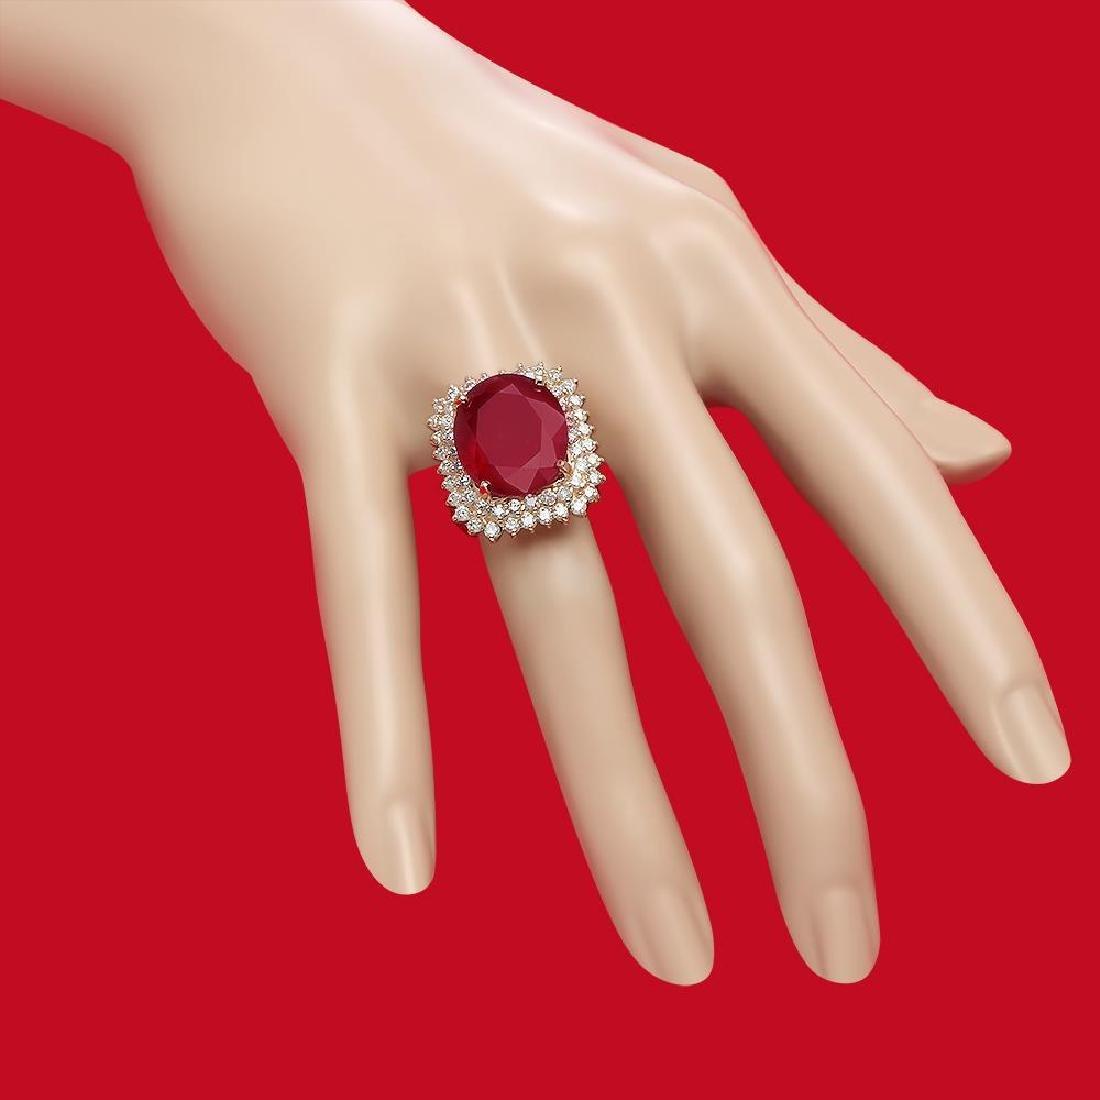 14K Gold 14.12ct Ruby 1.74ct Diamond Ring - 3